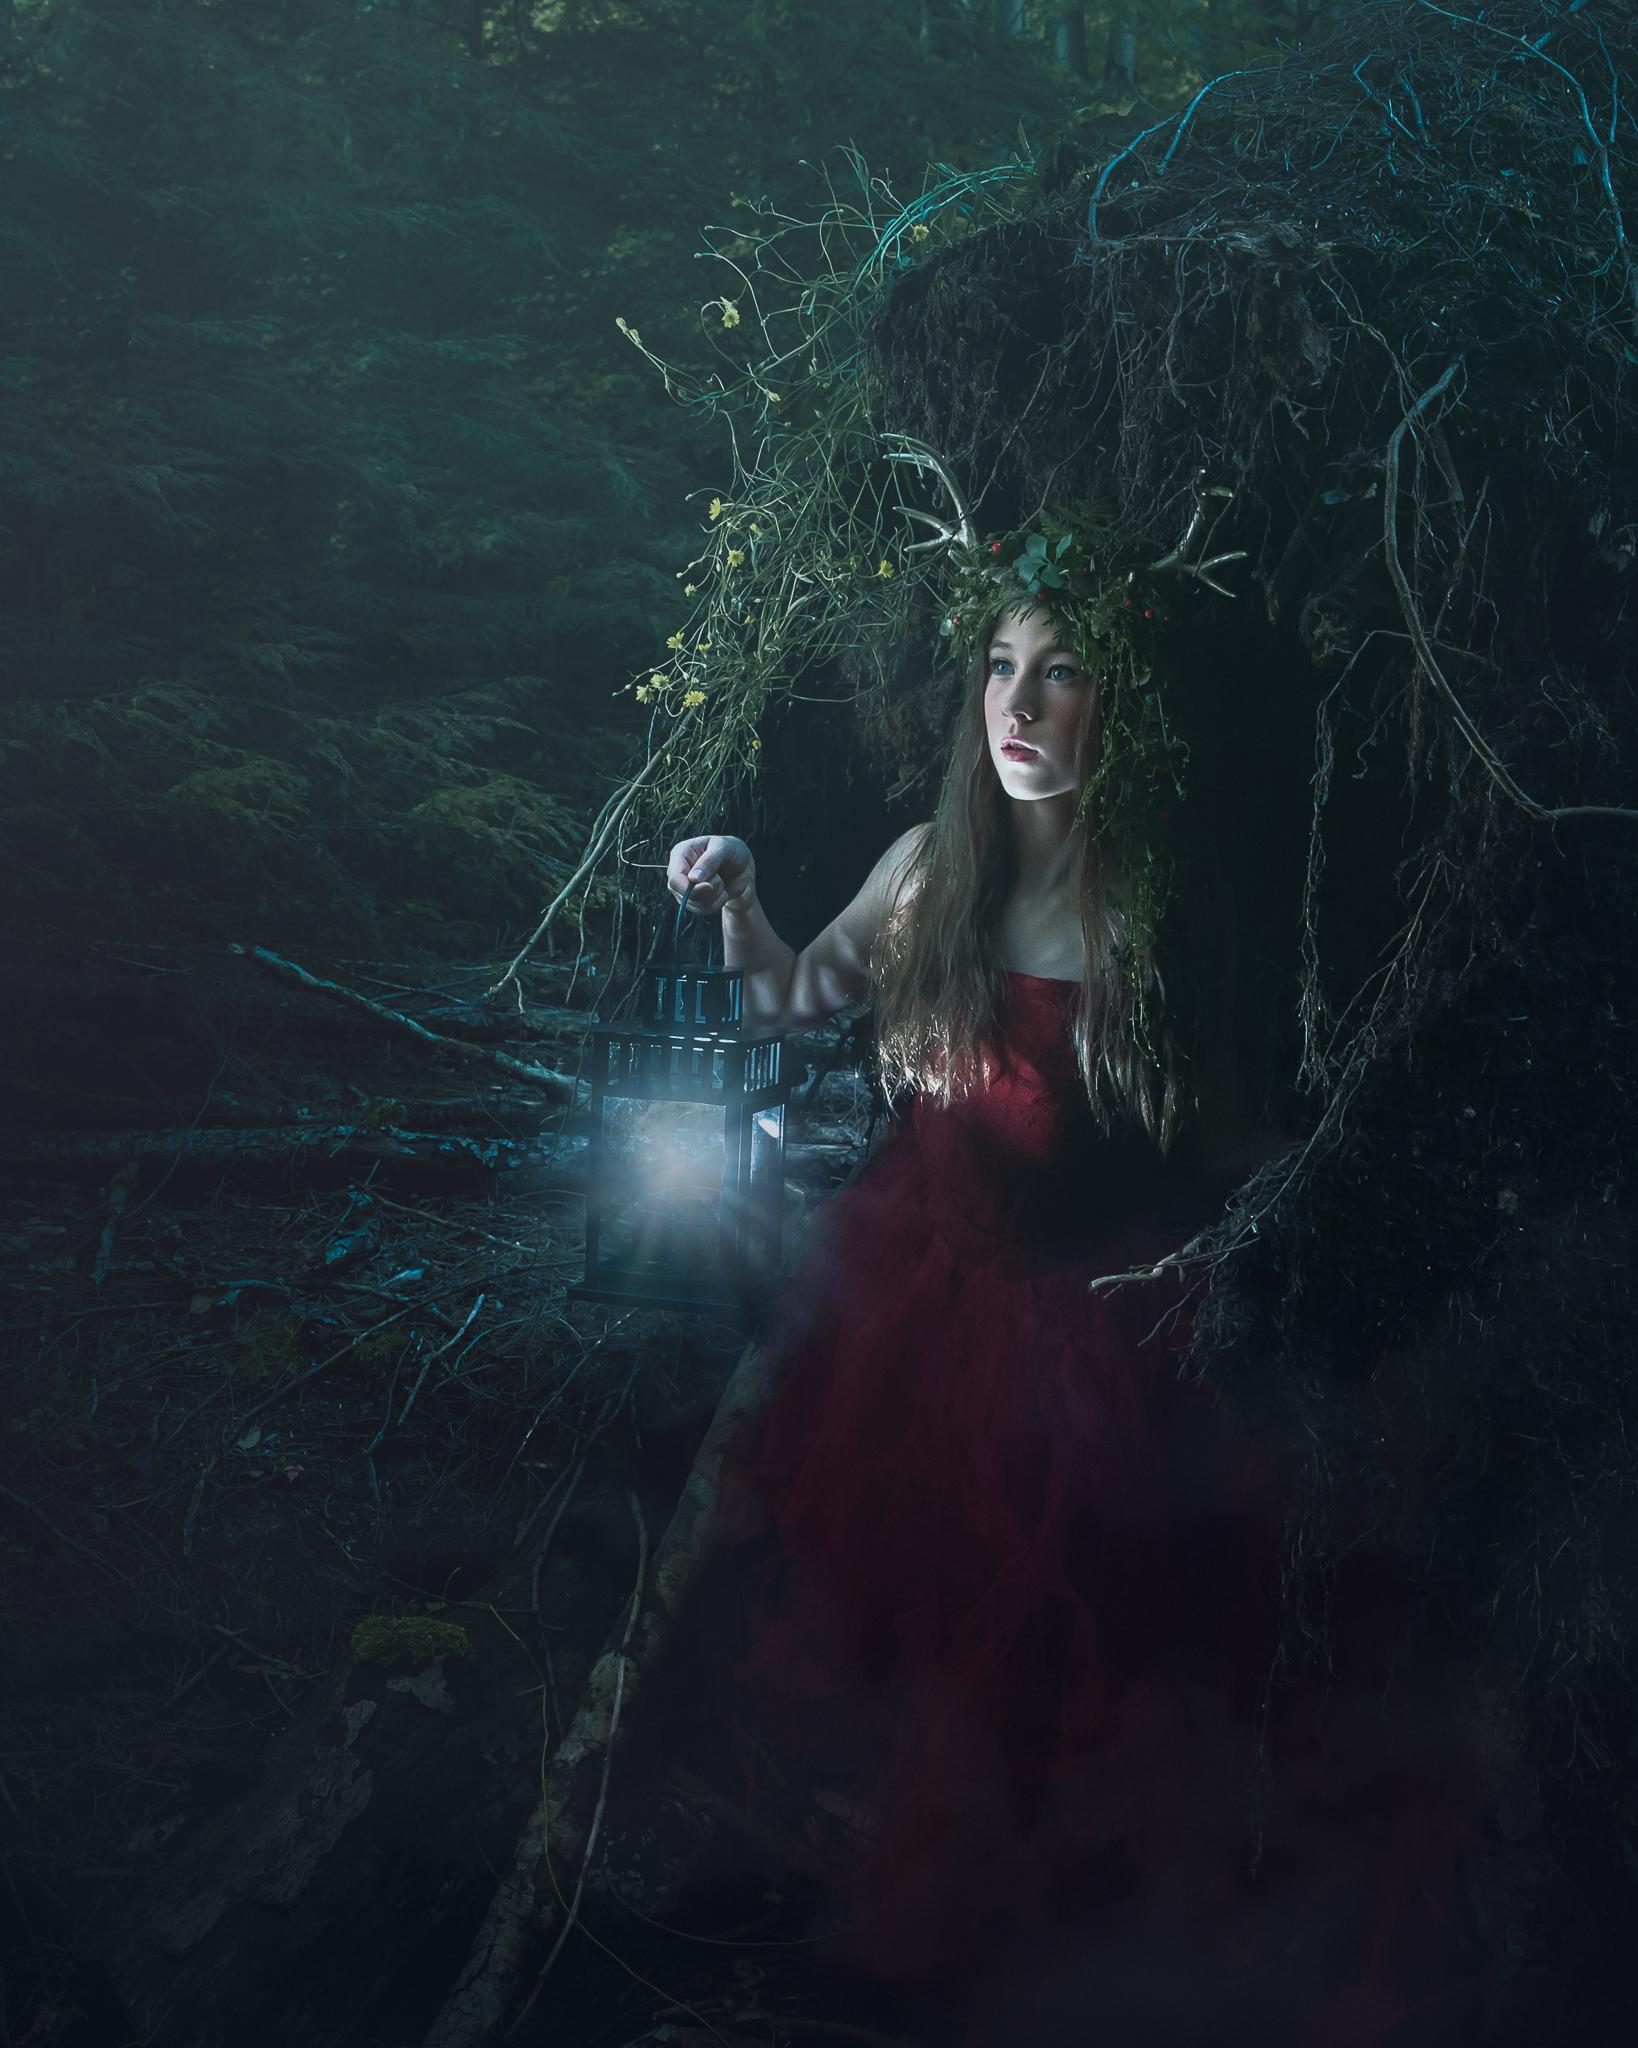 alana-lee-photography-girl with antlers